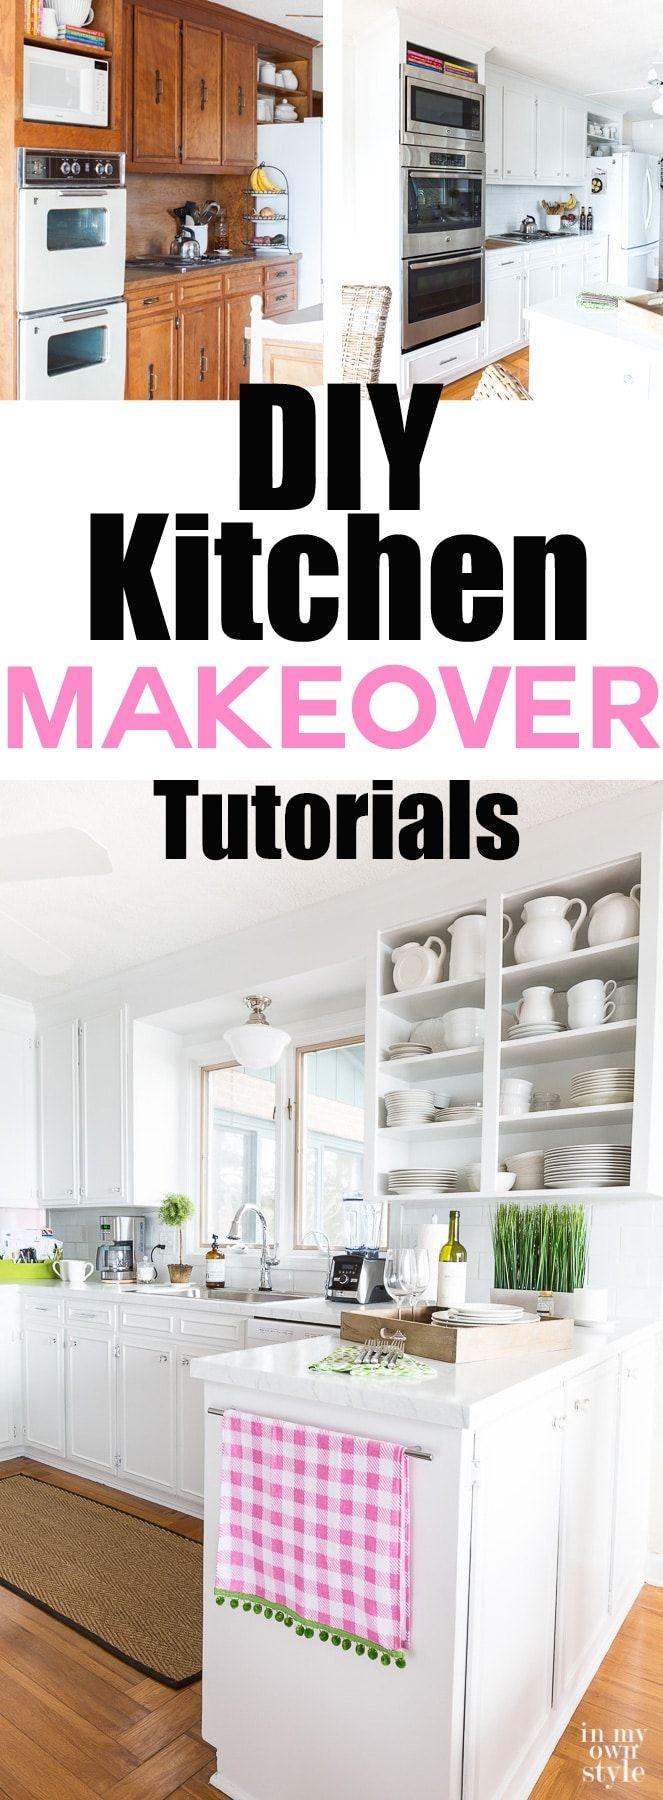 Diy Kitchens On A Budget 138 Best Home  Kitchen Reno Images On Pinterest  Kitchen Reno